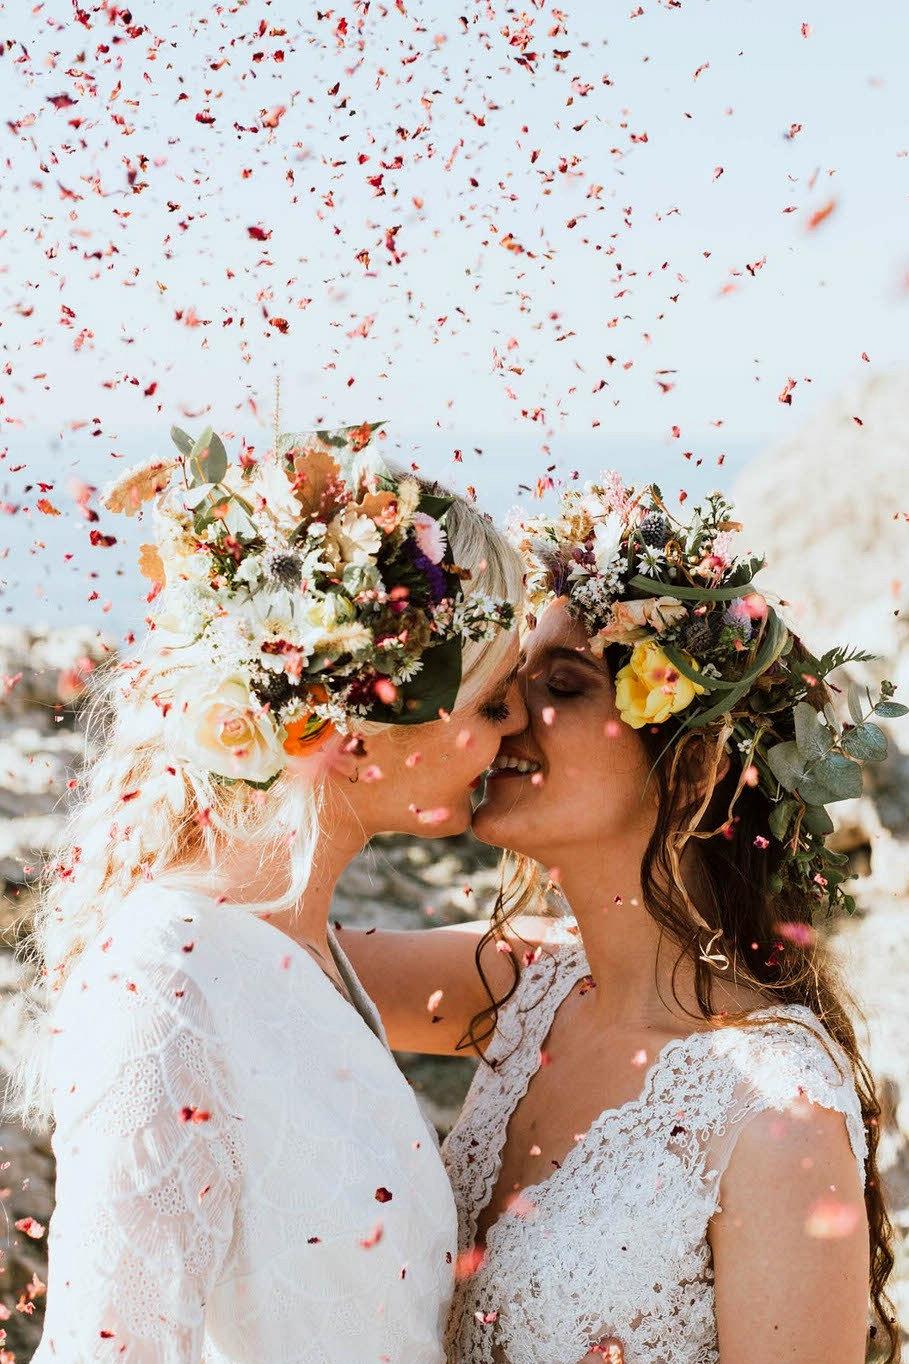 brides kiss as confetti falls around them